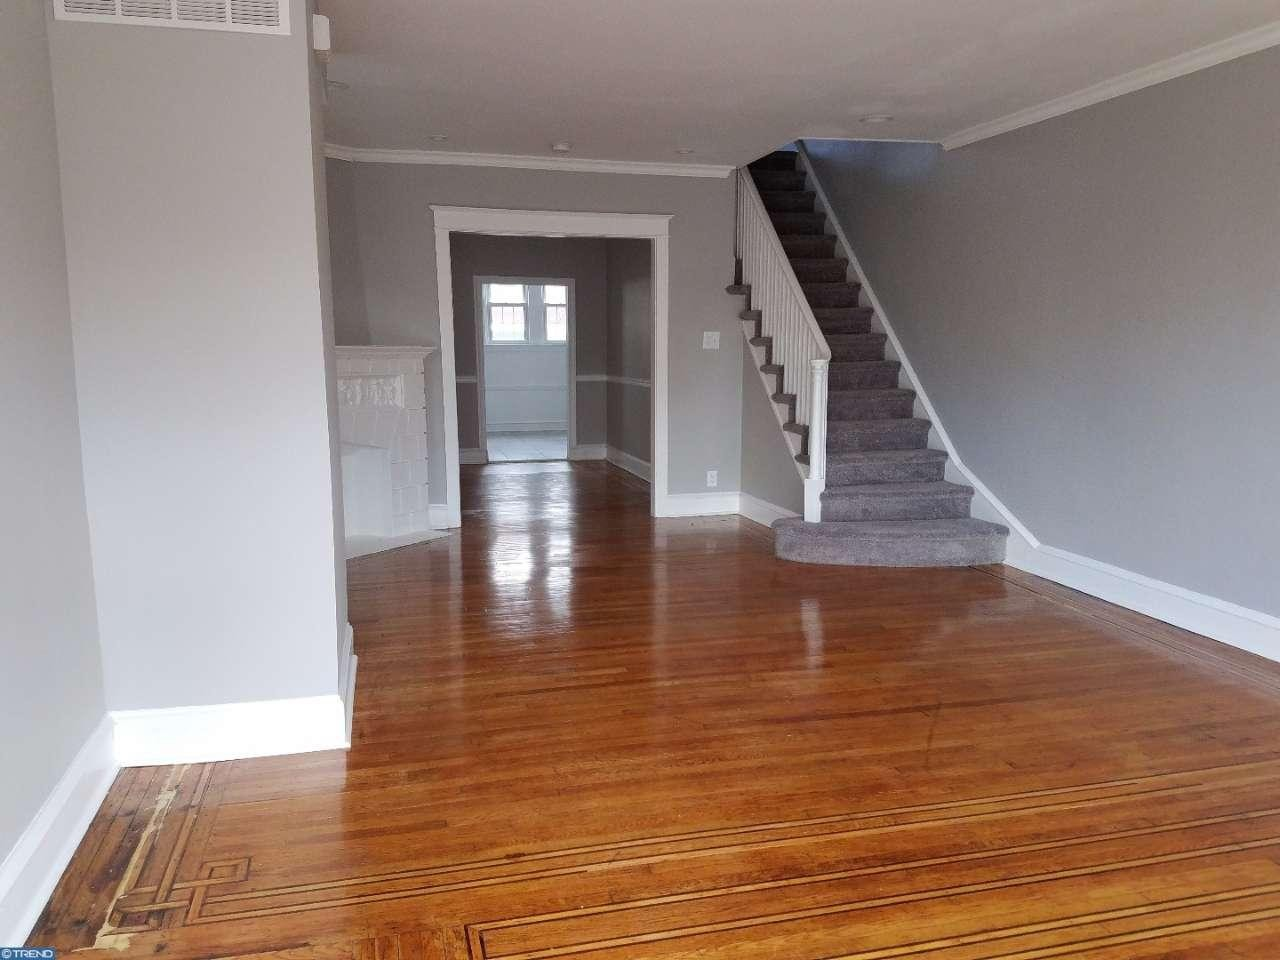 1343 st vincent st philadelphia pa 19111 apartment rental